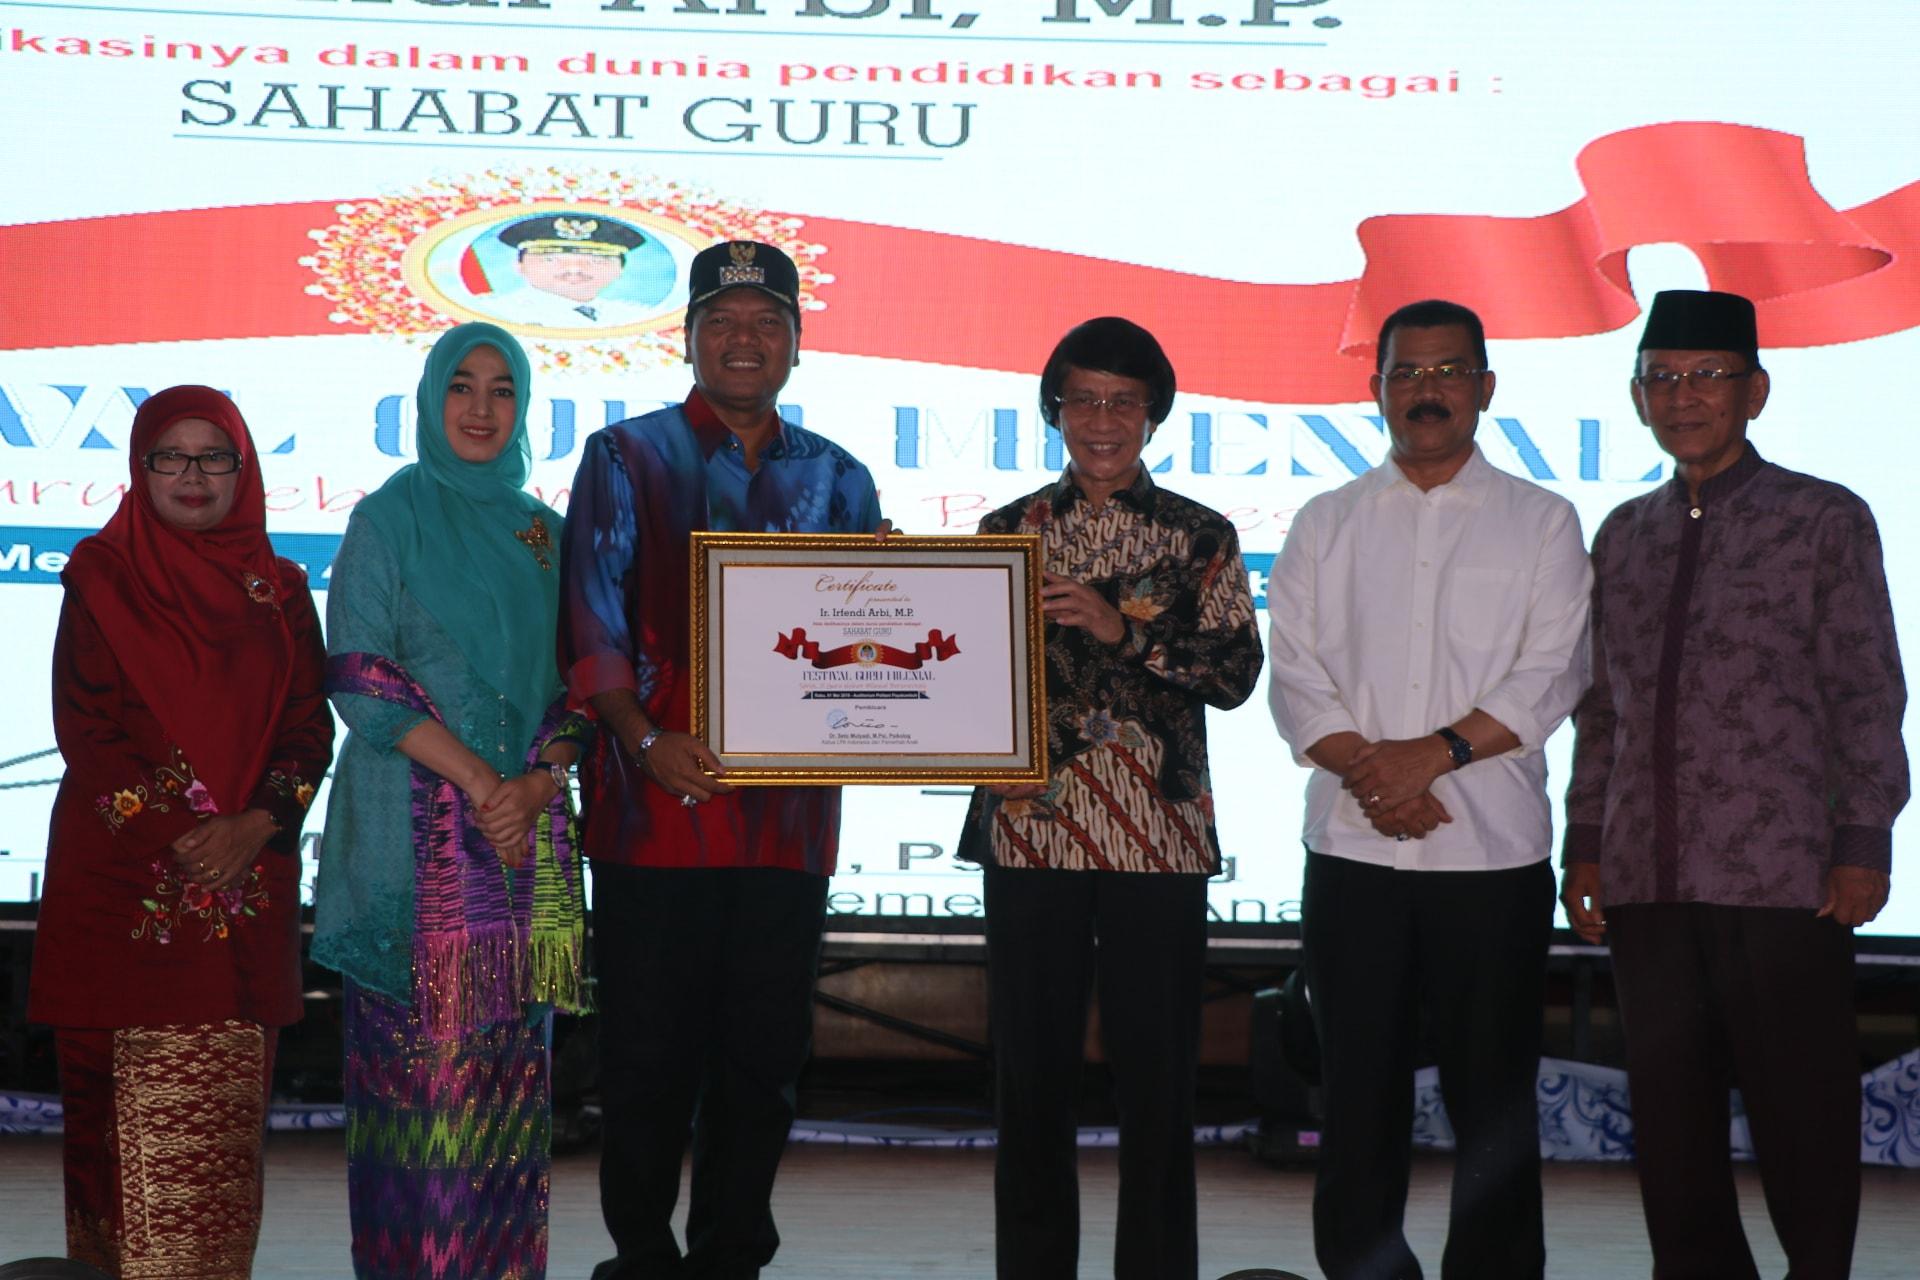 Festival Guru Milenial, Irfendi Arbi beserta Istri Diganjar Penghargaan